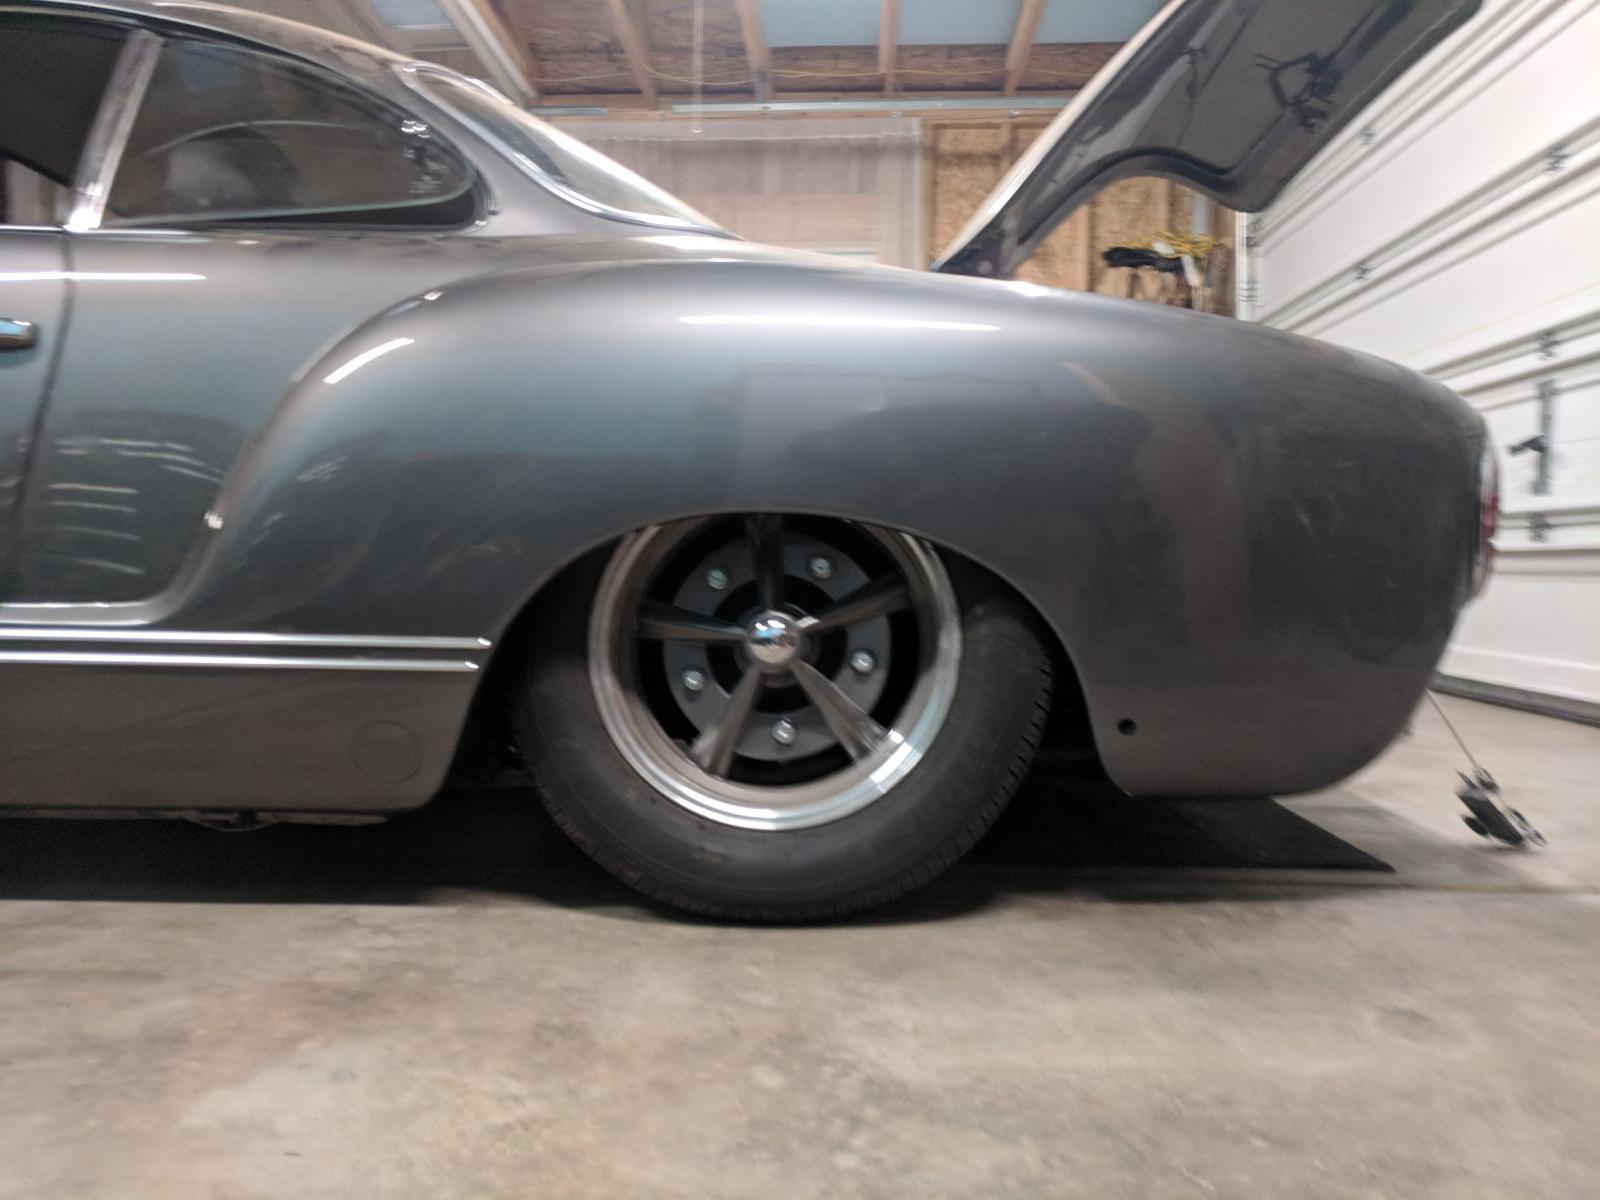 Adjusting the rear spring plates